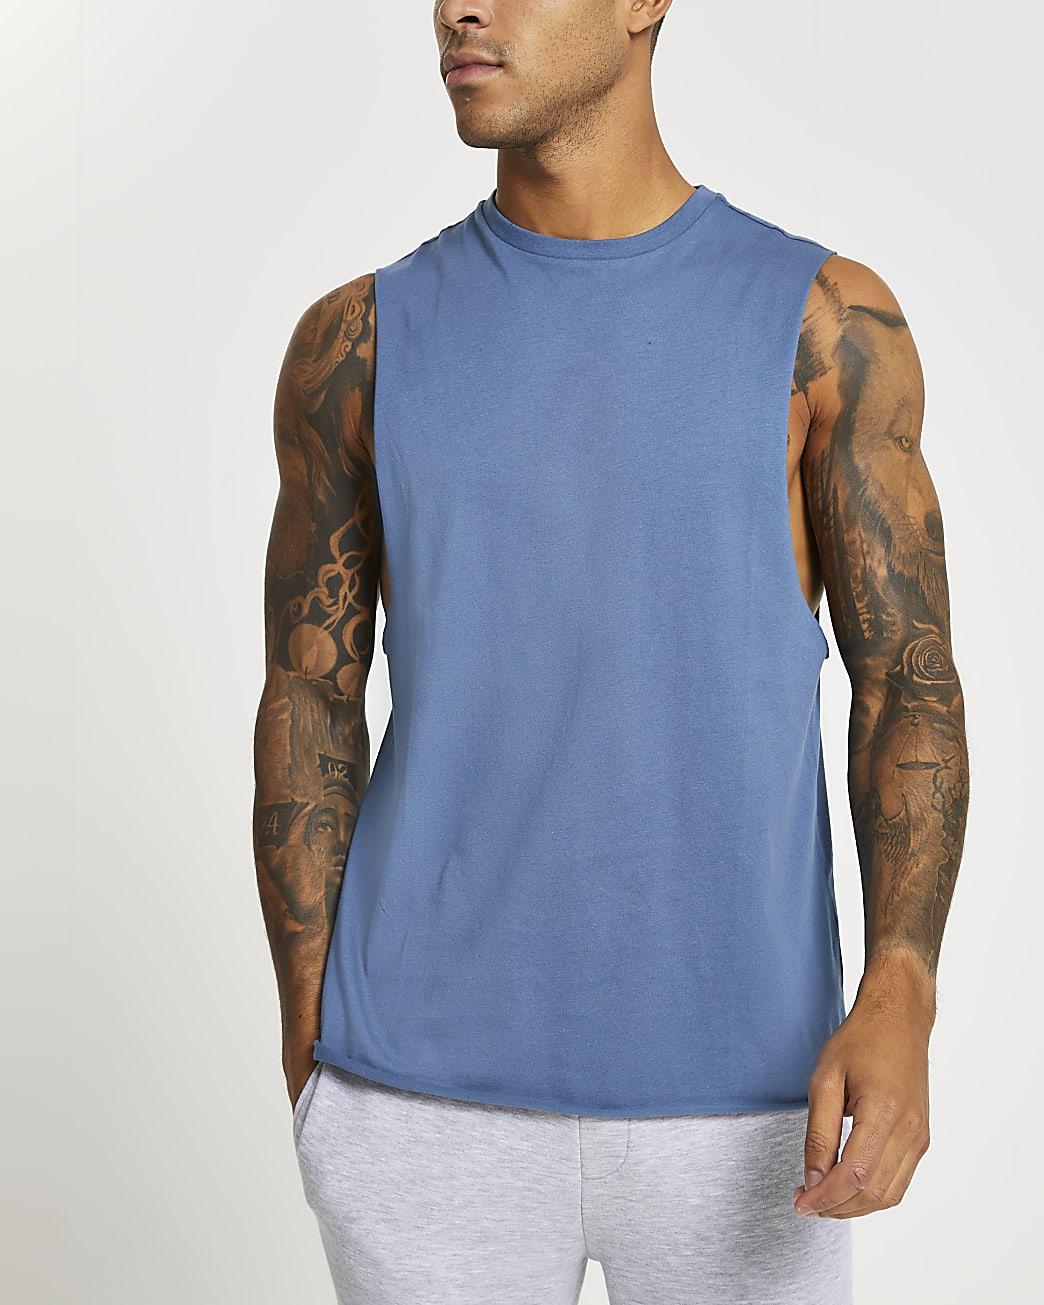 Blue slim fit tank vest